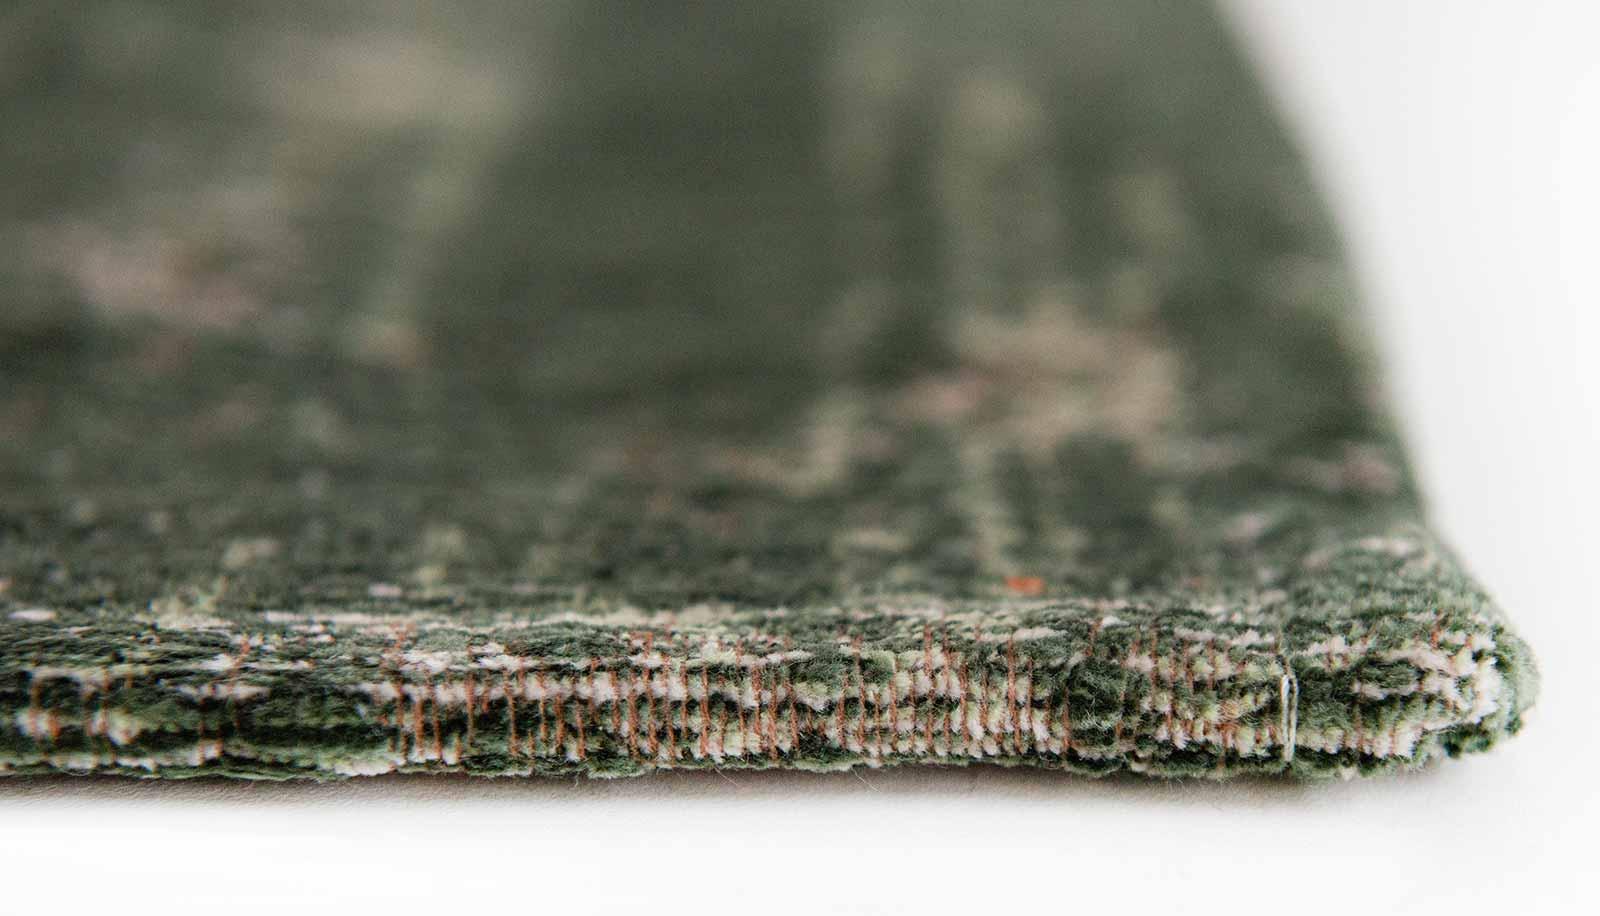 Louis De Poortere teppich LX 9146 Fading World Majestic Forest side